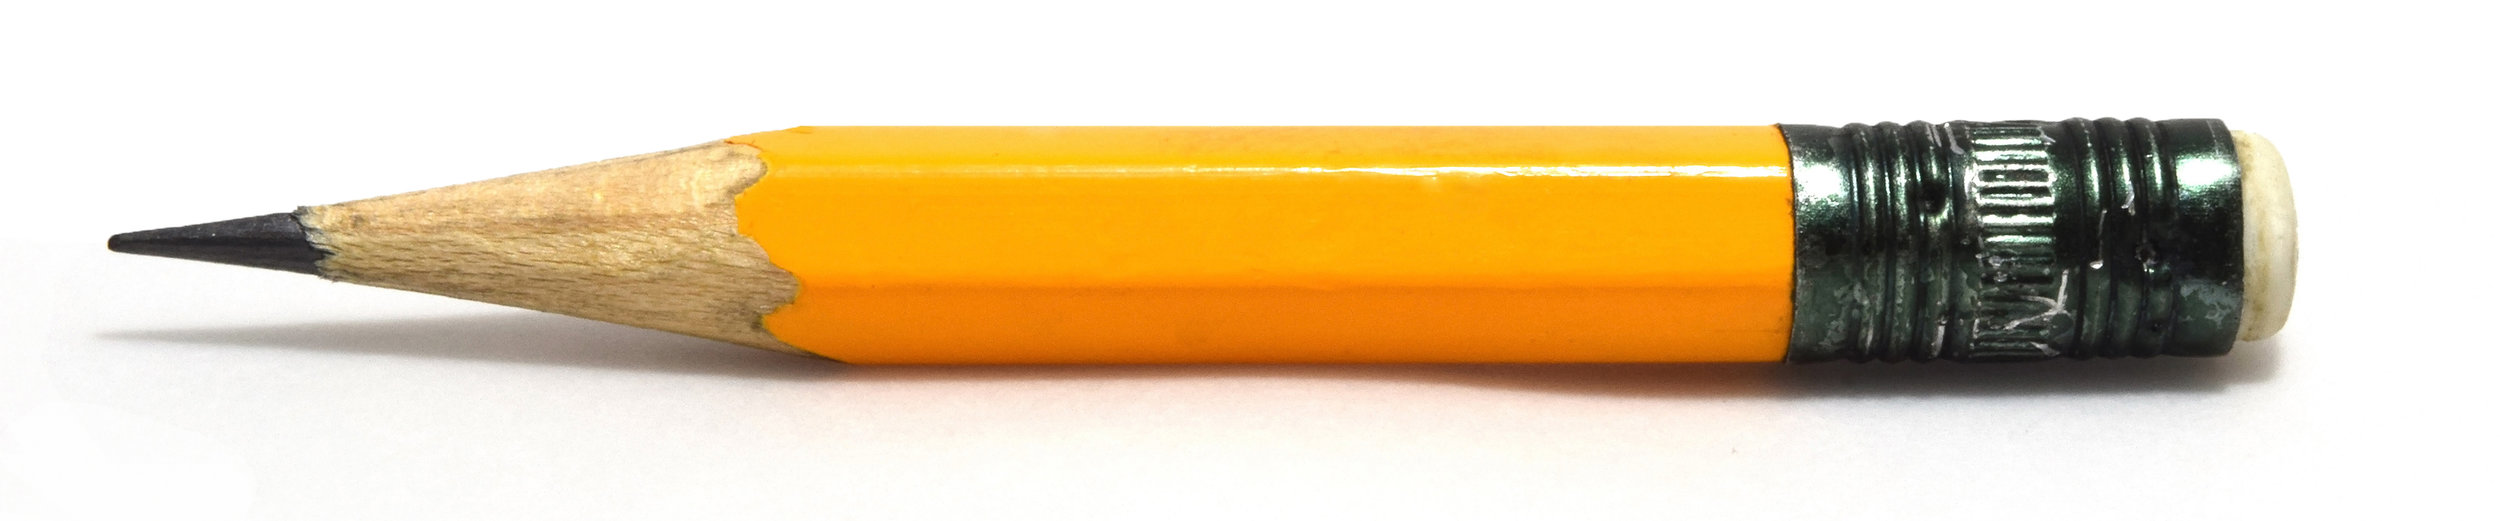 pencil_web.jpg